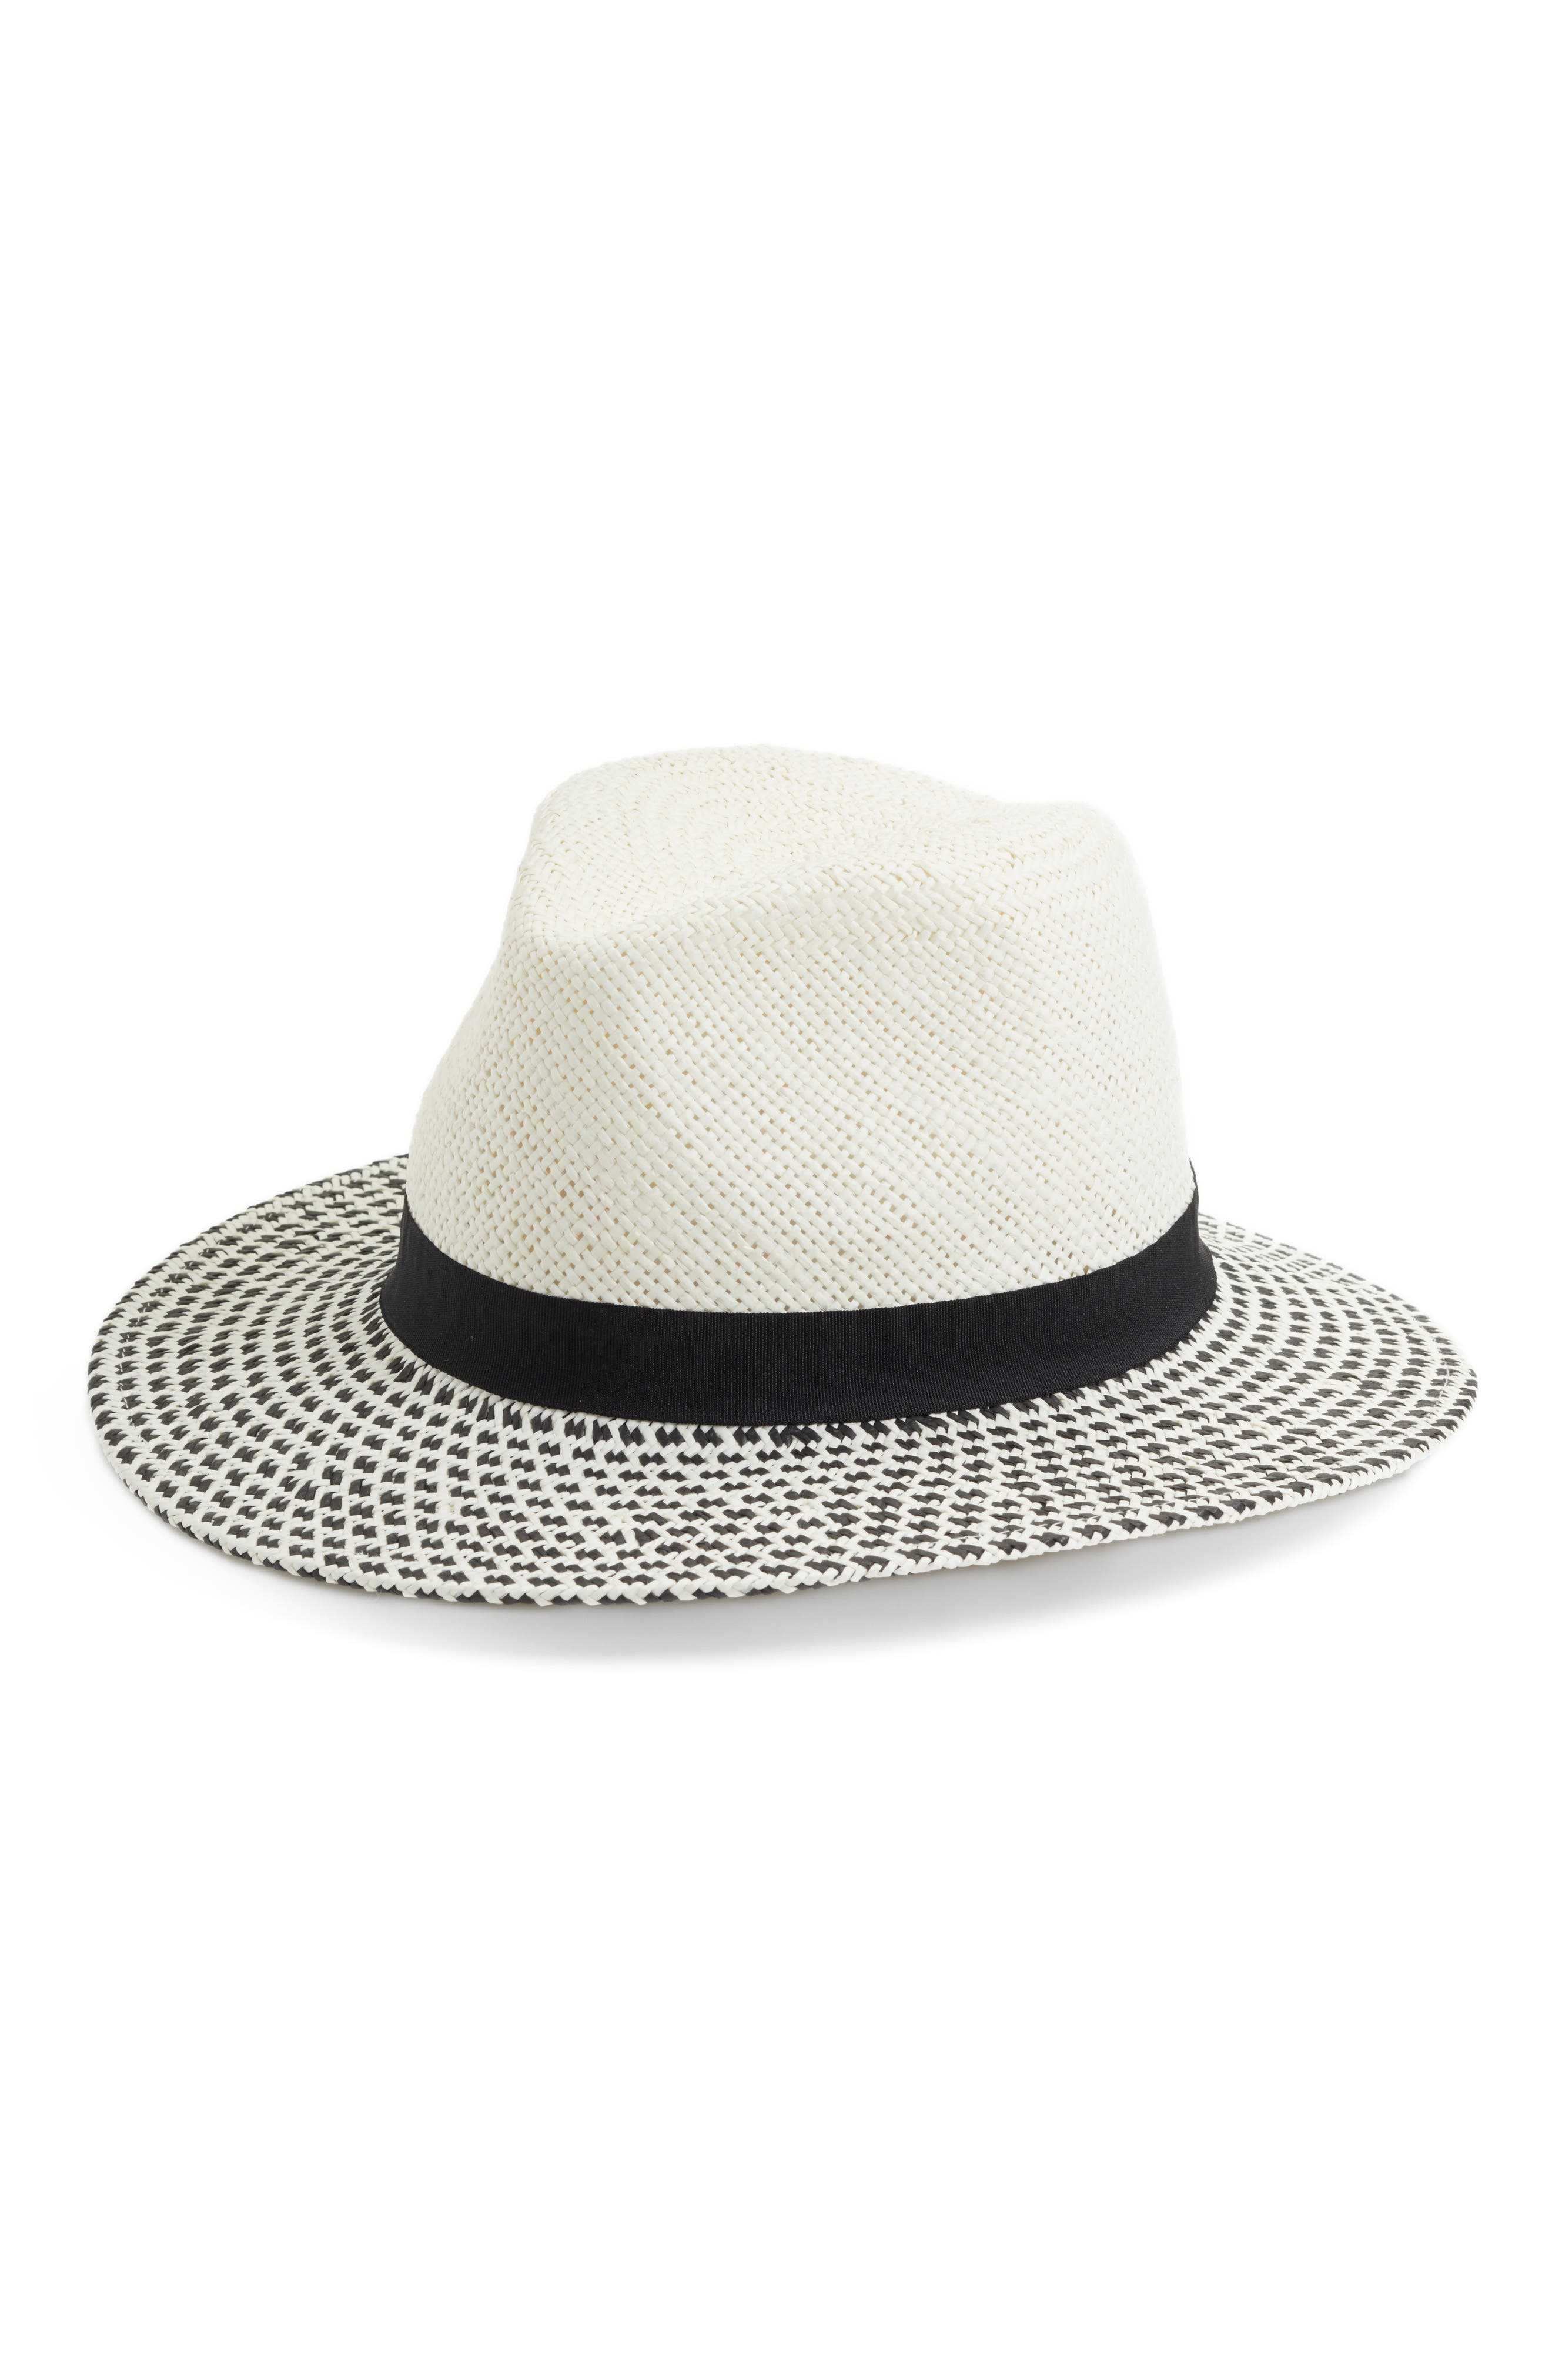 Alternate Image 1 Selected - Halogen® Modern Panama Hat